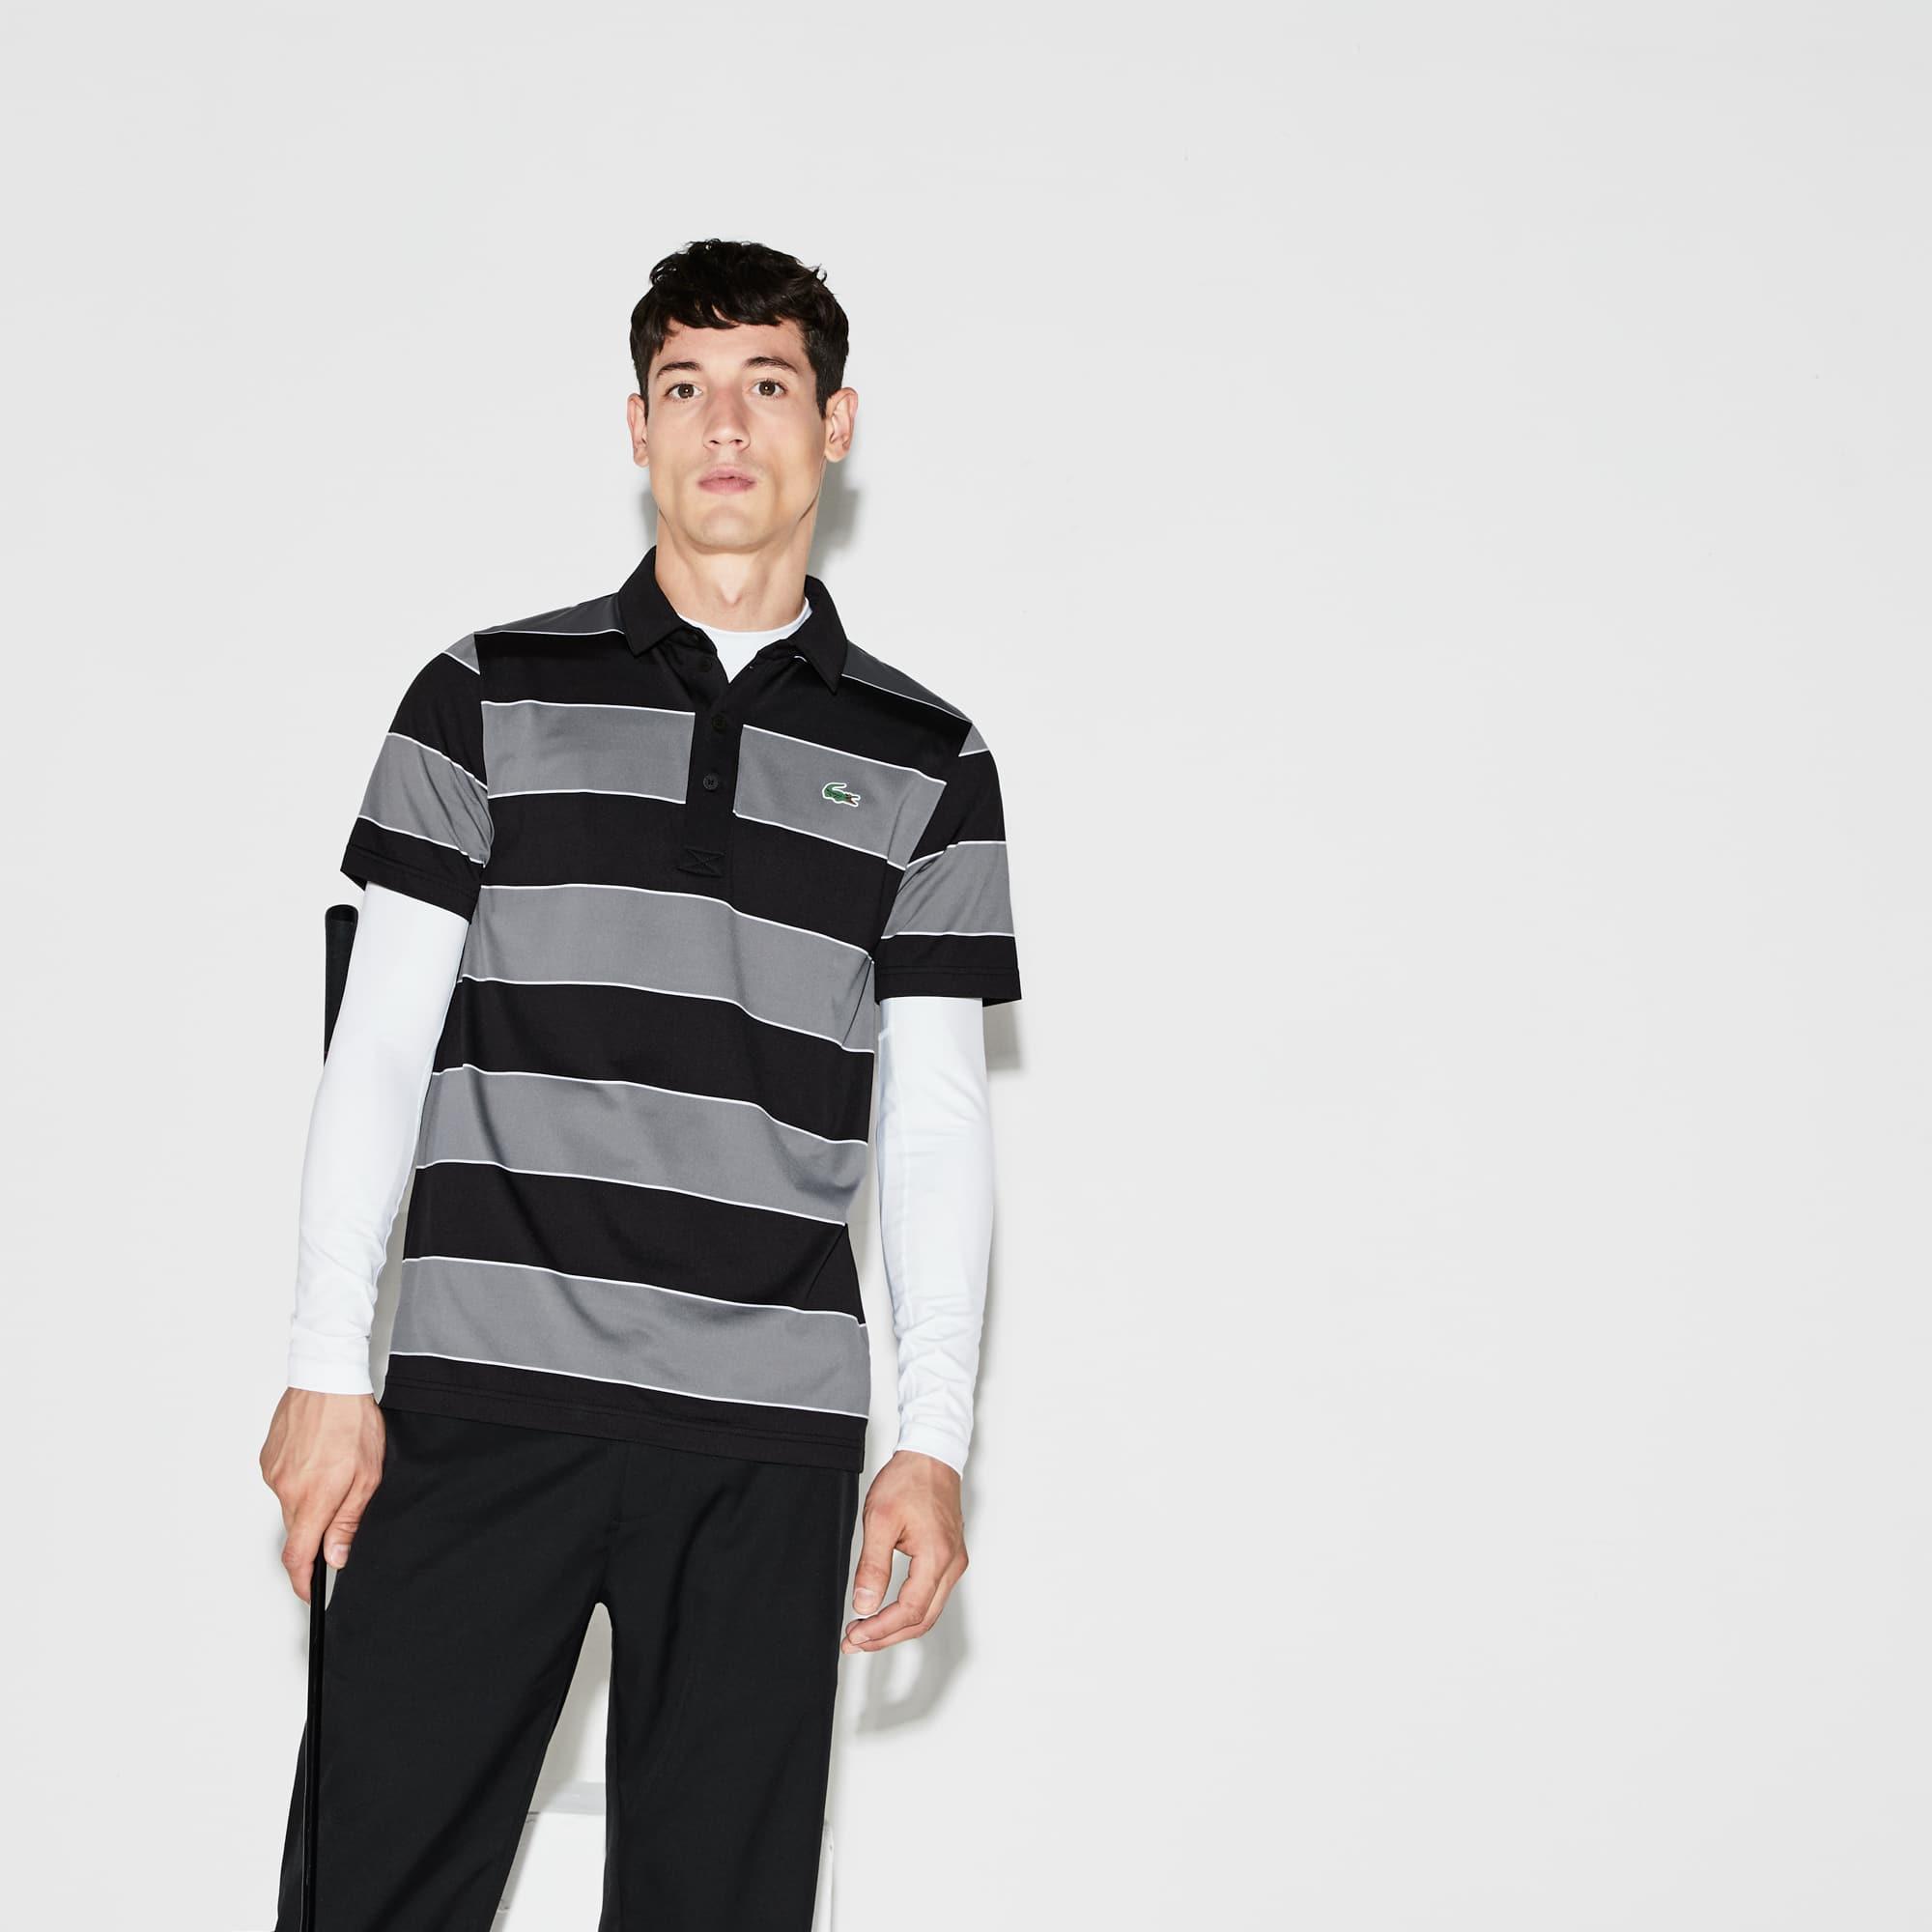 Lacoste - Herren LACOSTE SPORT gestreiftes Golf-Poloshirt aus Jersey - 1